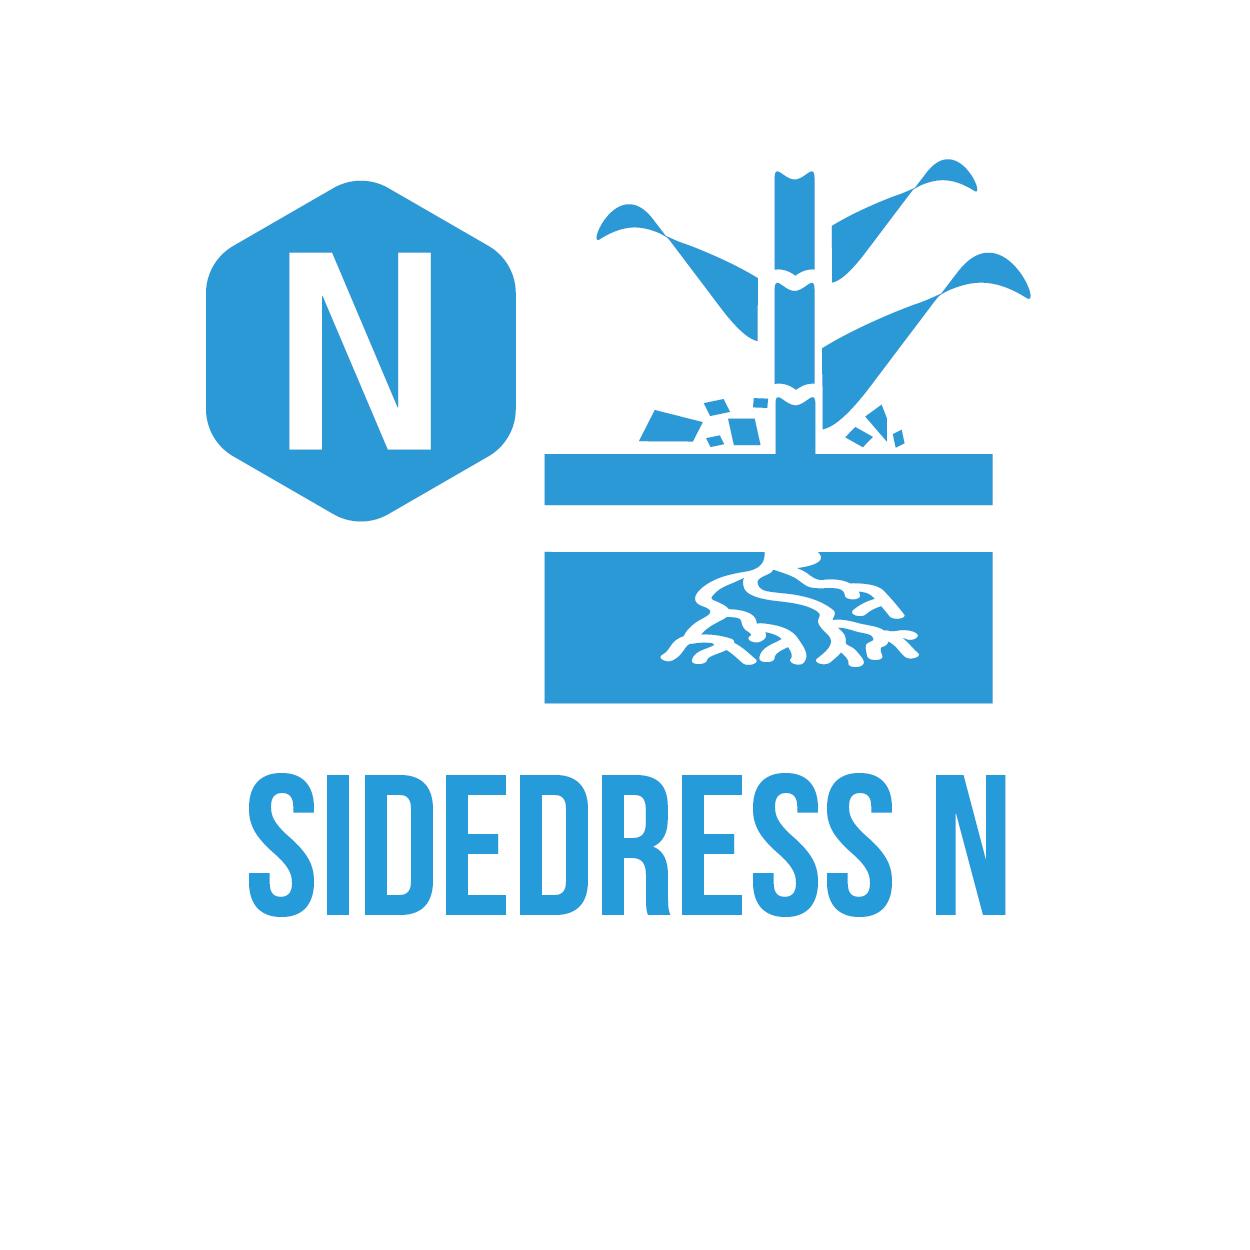 icon-sidedressN-square.jpg